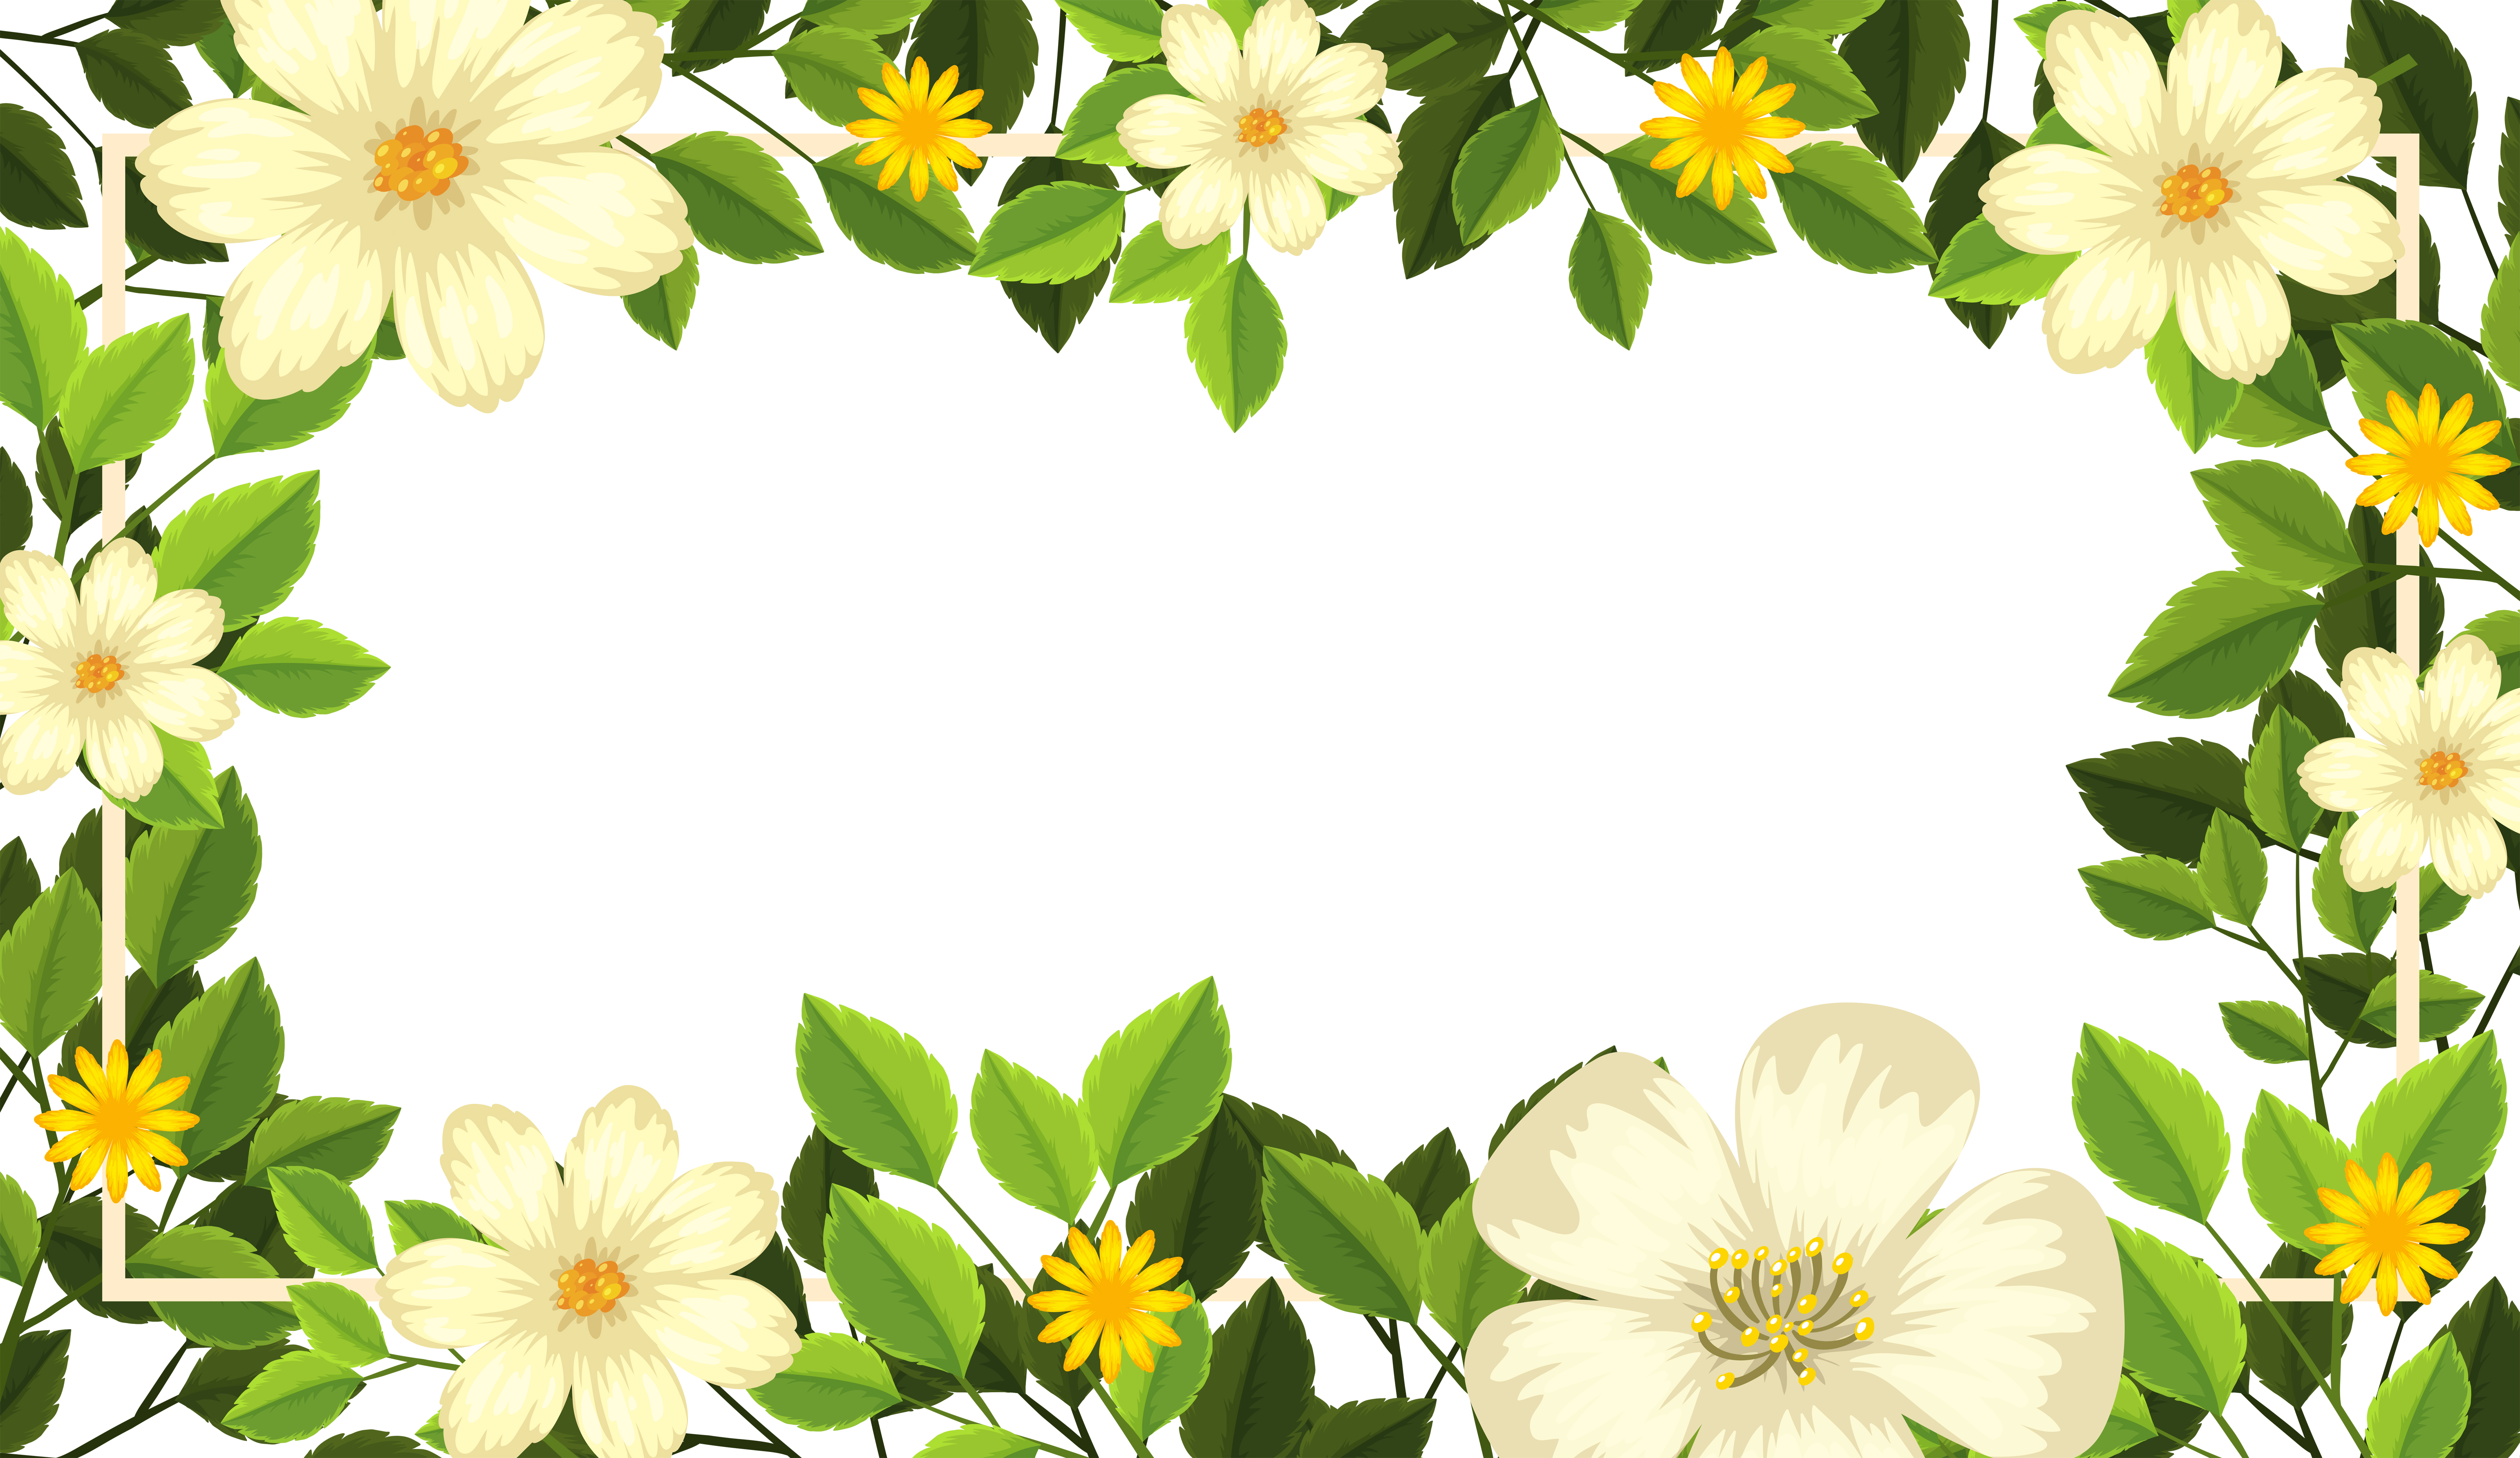 beautiful flower blank card 696128 vector art at vecteezy